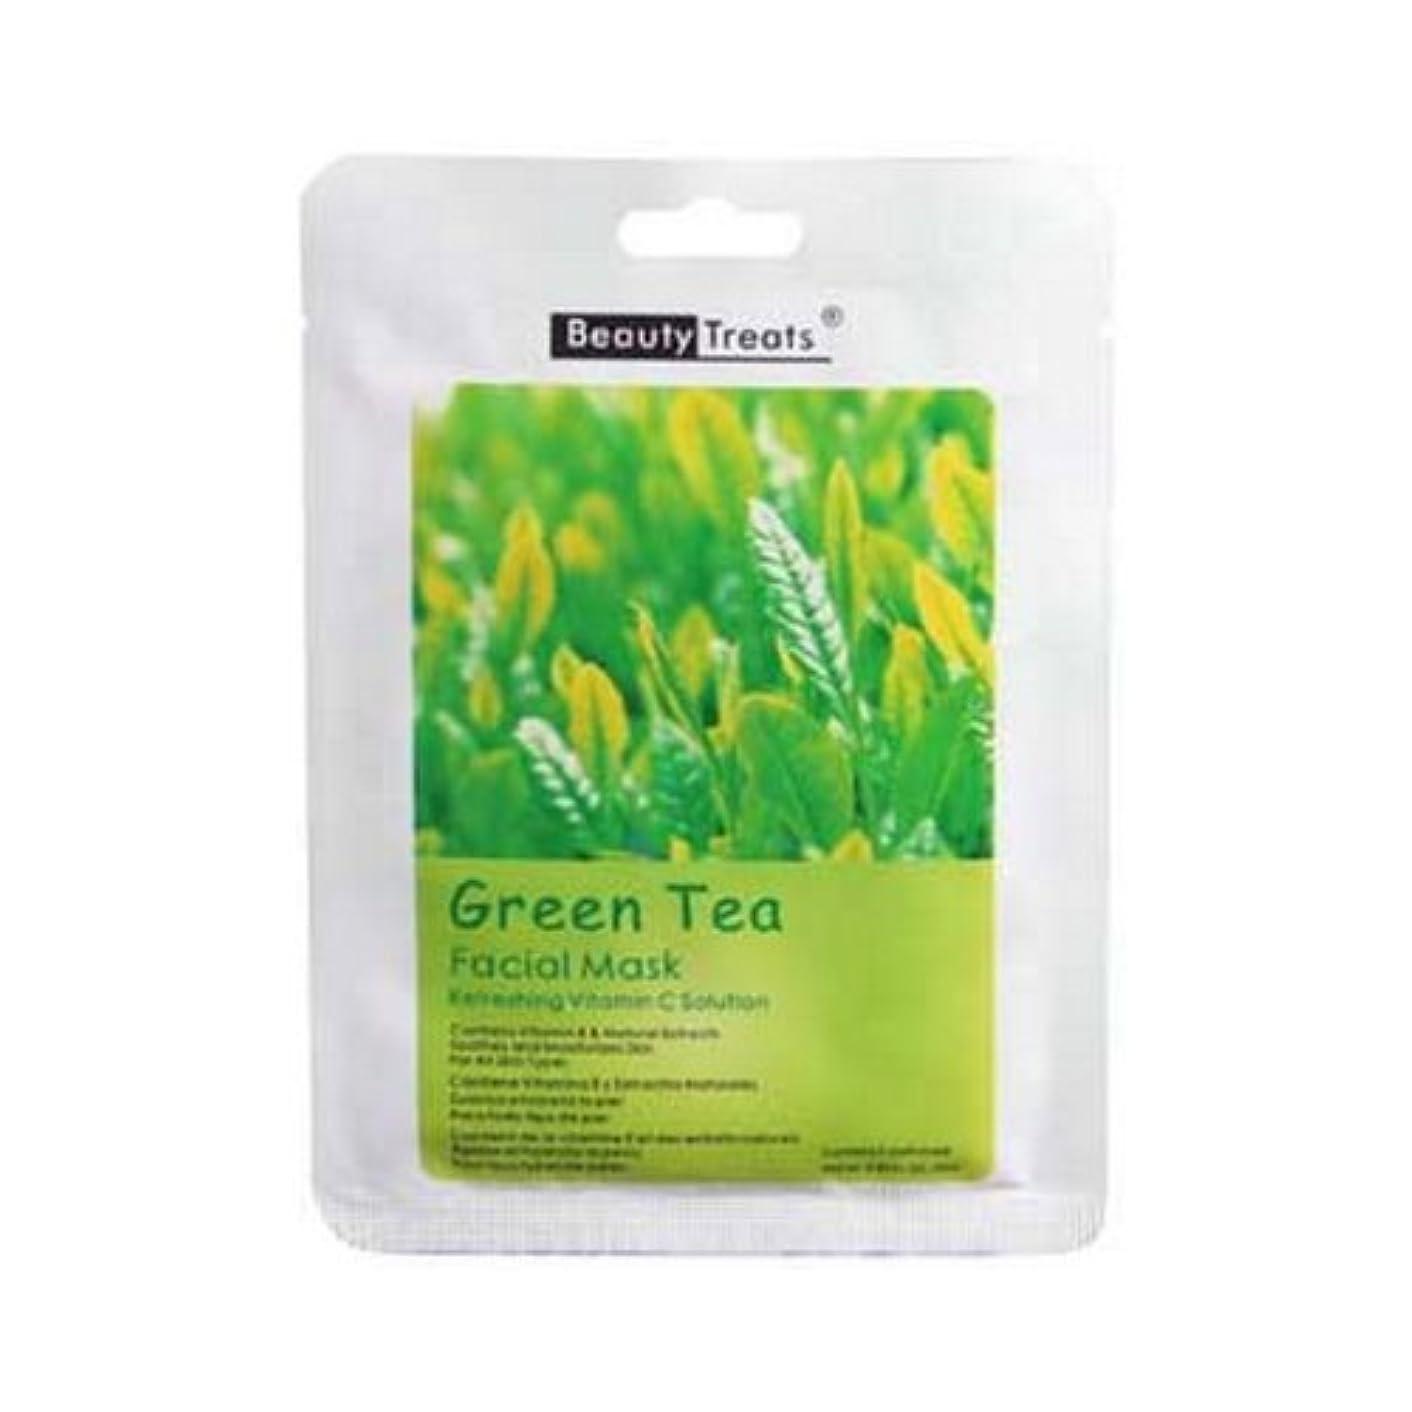 (6 Pack) BEAUTY TREATS Facial Mask Refreshing Vitamin C Solution - Green Tea (並行輸入品)